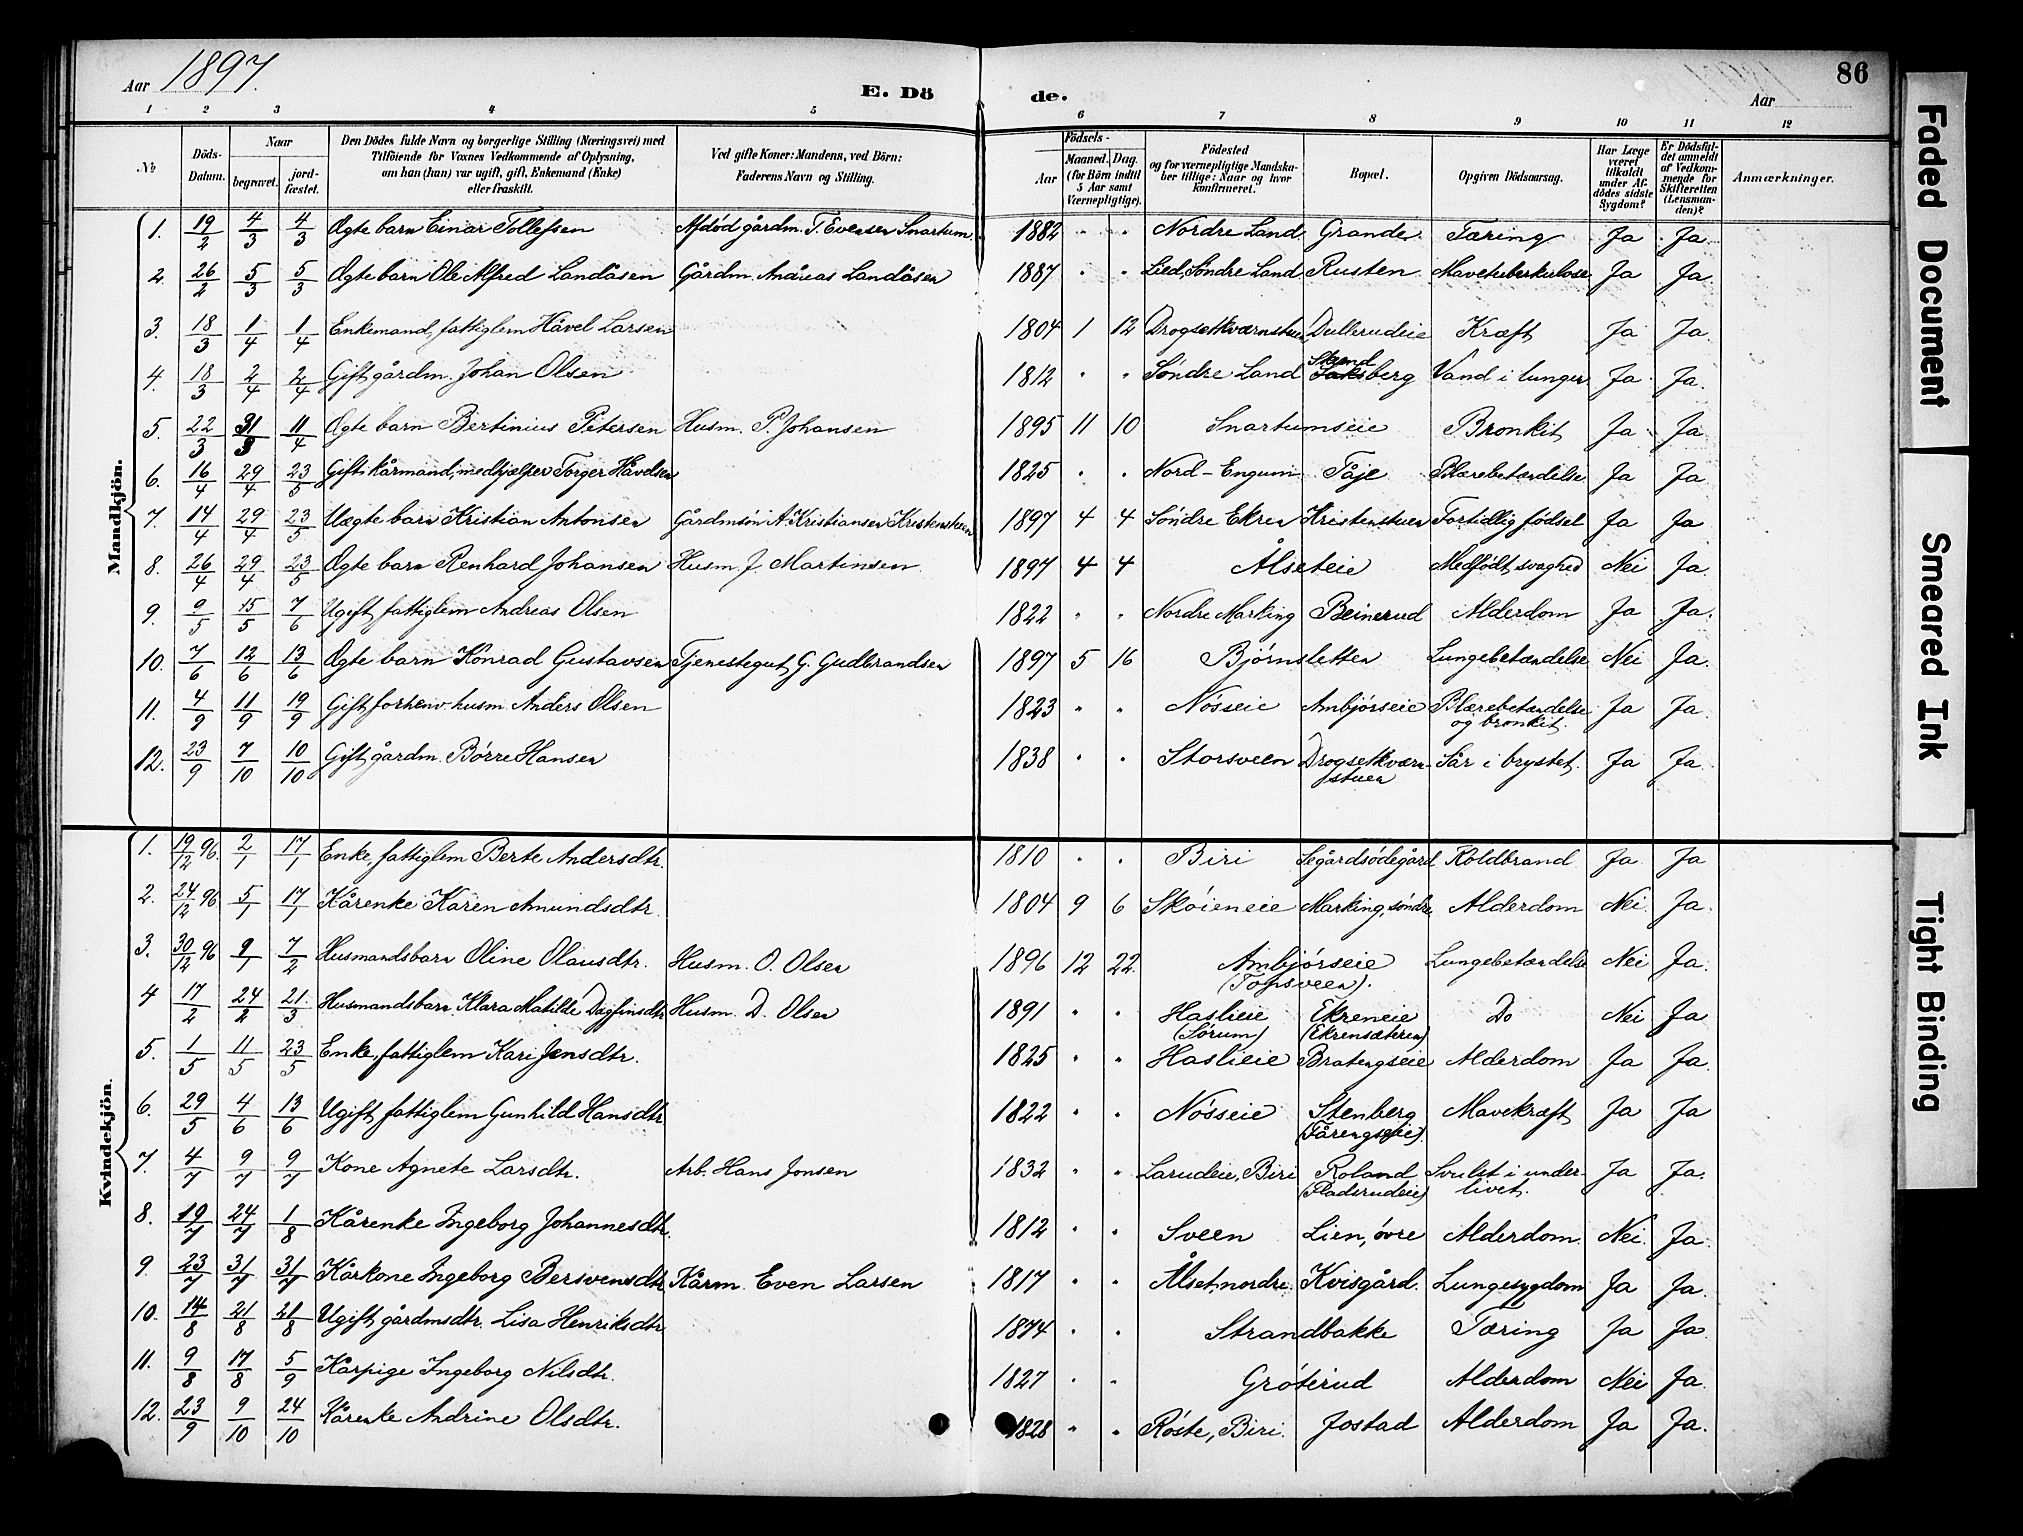 SAH, Biri prestekontor, Ministerialbok nr. 8, 1894-1901, s. 86